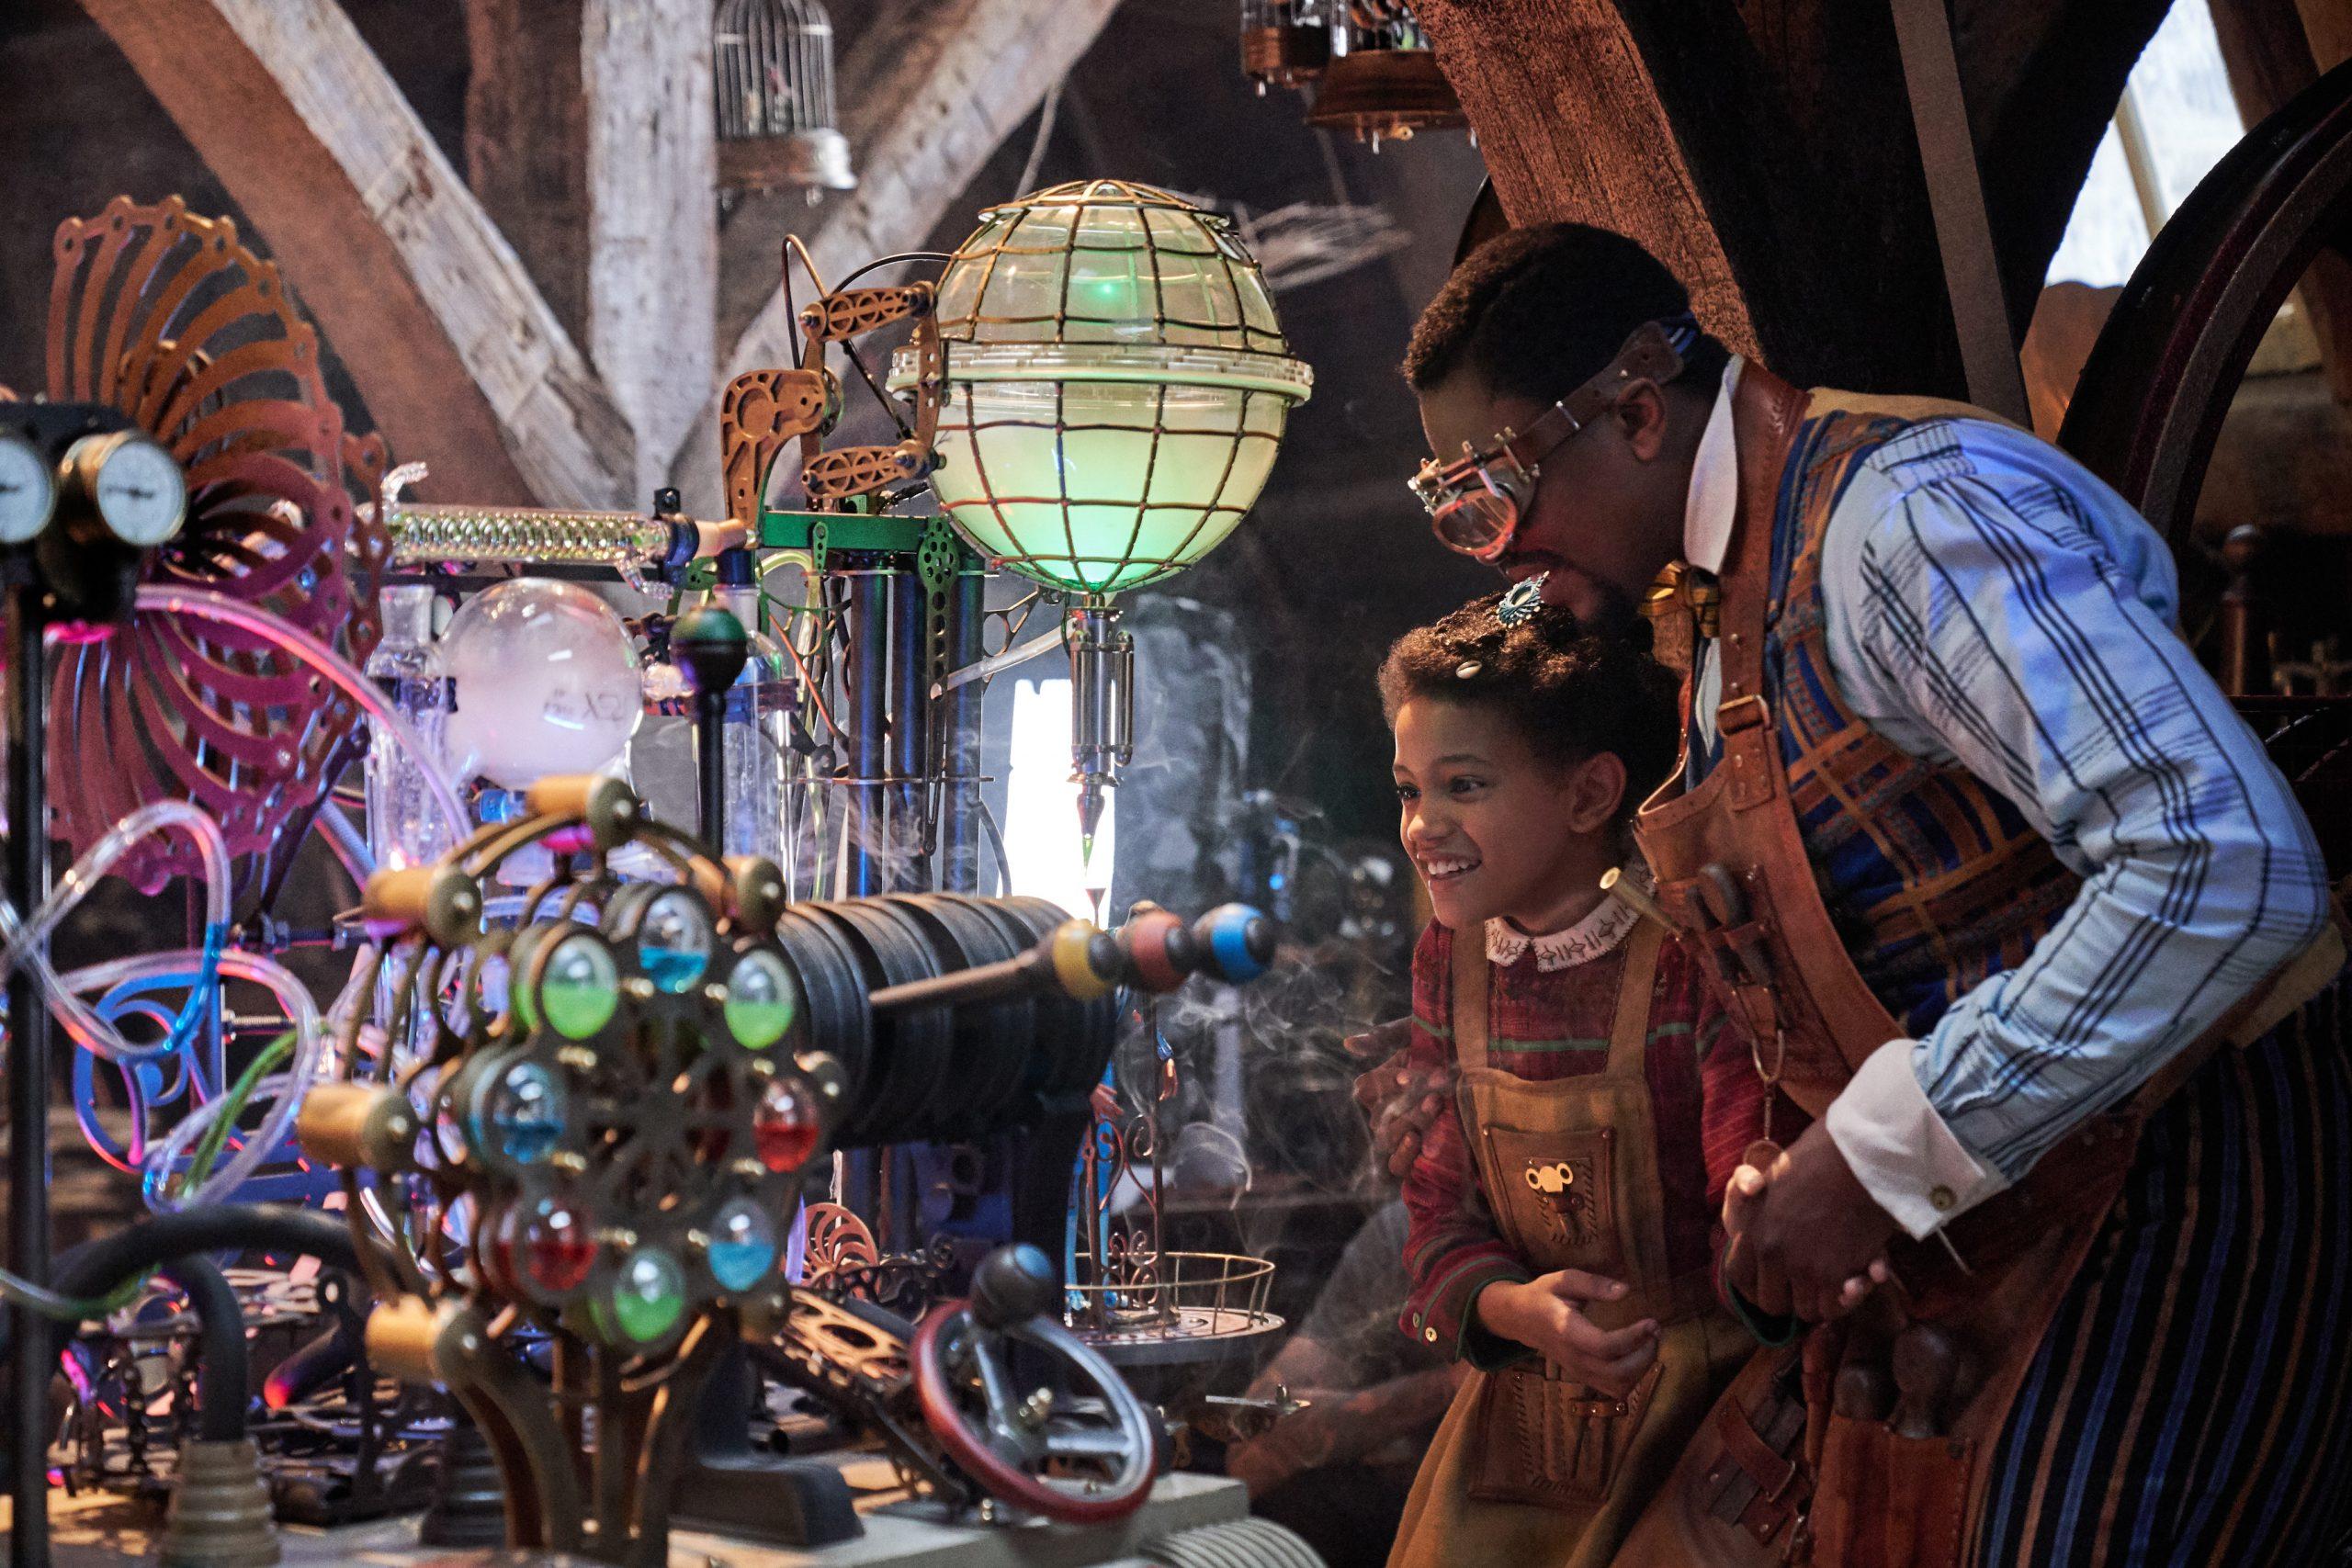 JINGLE JANGLE: A CHRISTMAS JOURNEY (2020) Diaana Babnicova as Young Jessica Jangle and Justin Cornwell as Young Jeronicus Jangle. Cr.Gareth Gatrell/NETFLIX